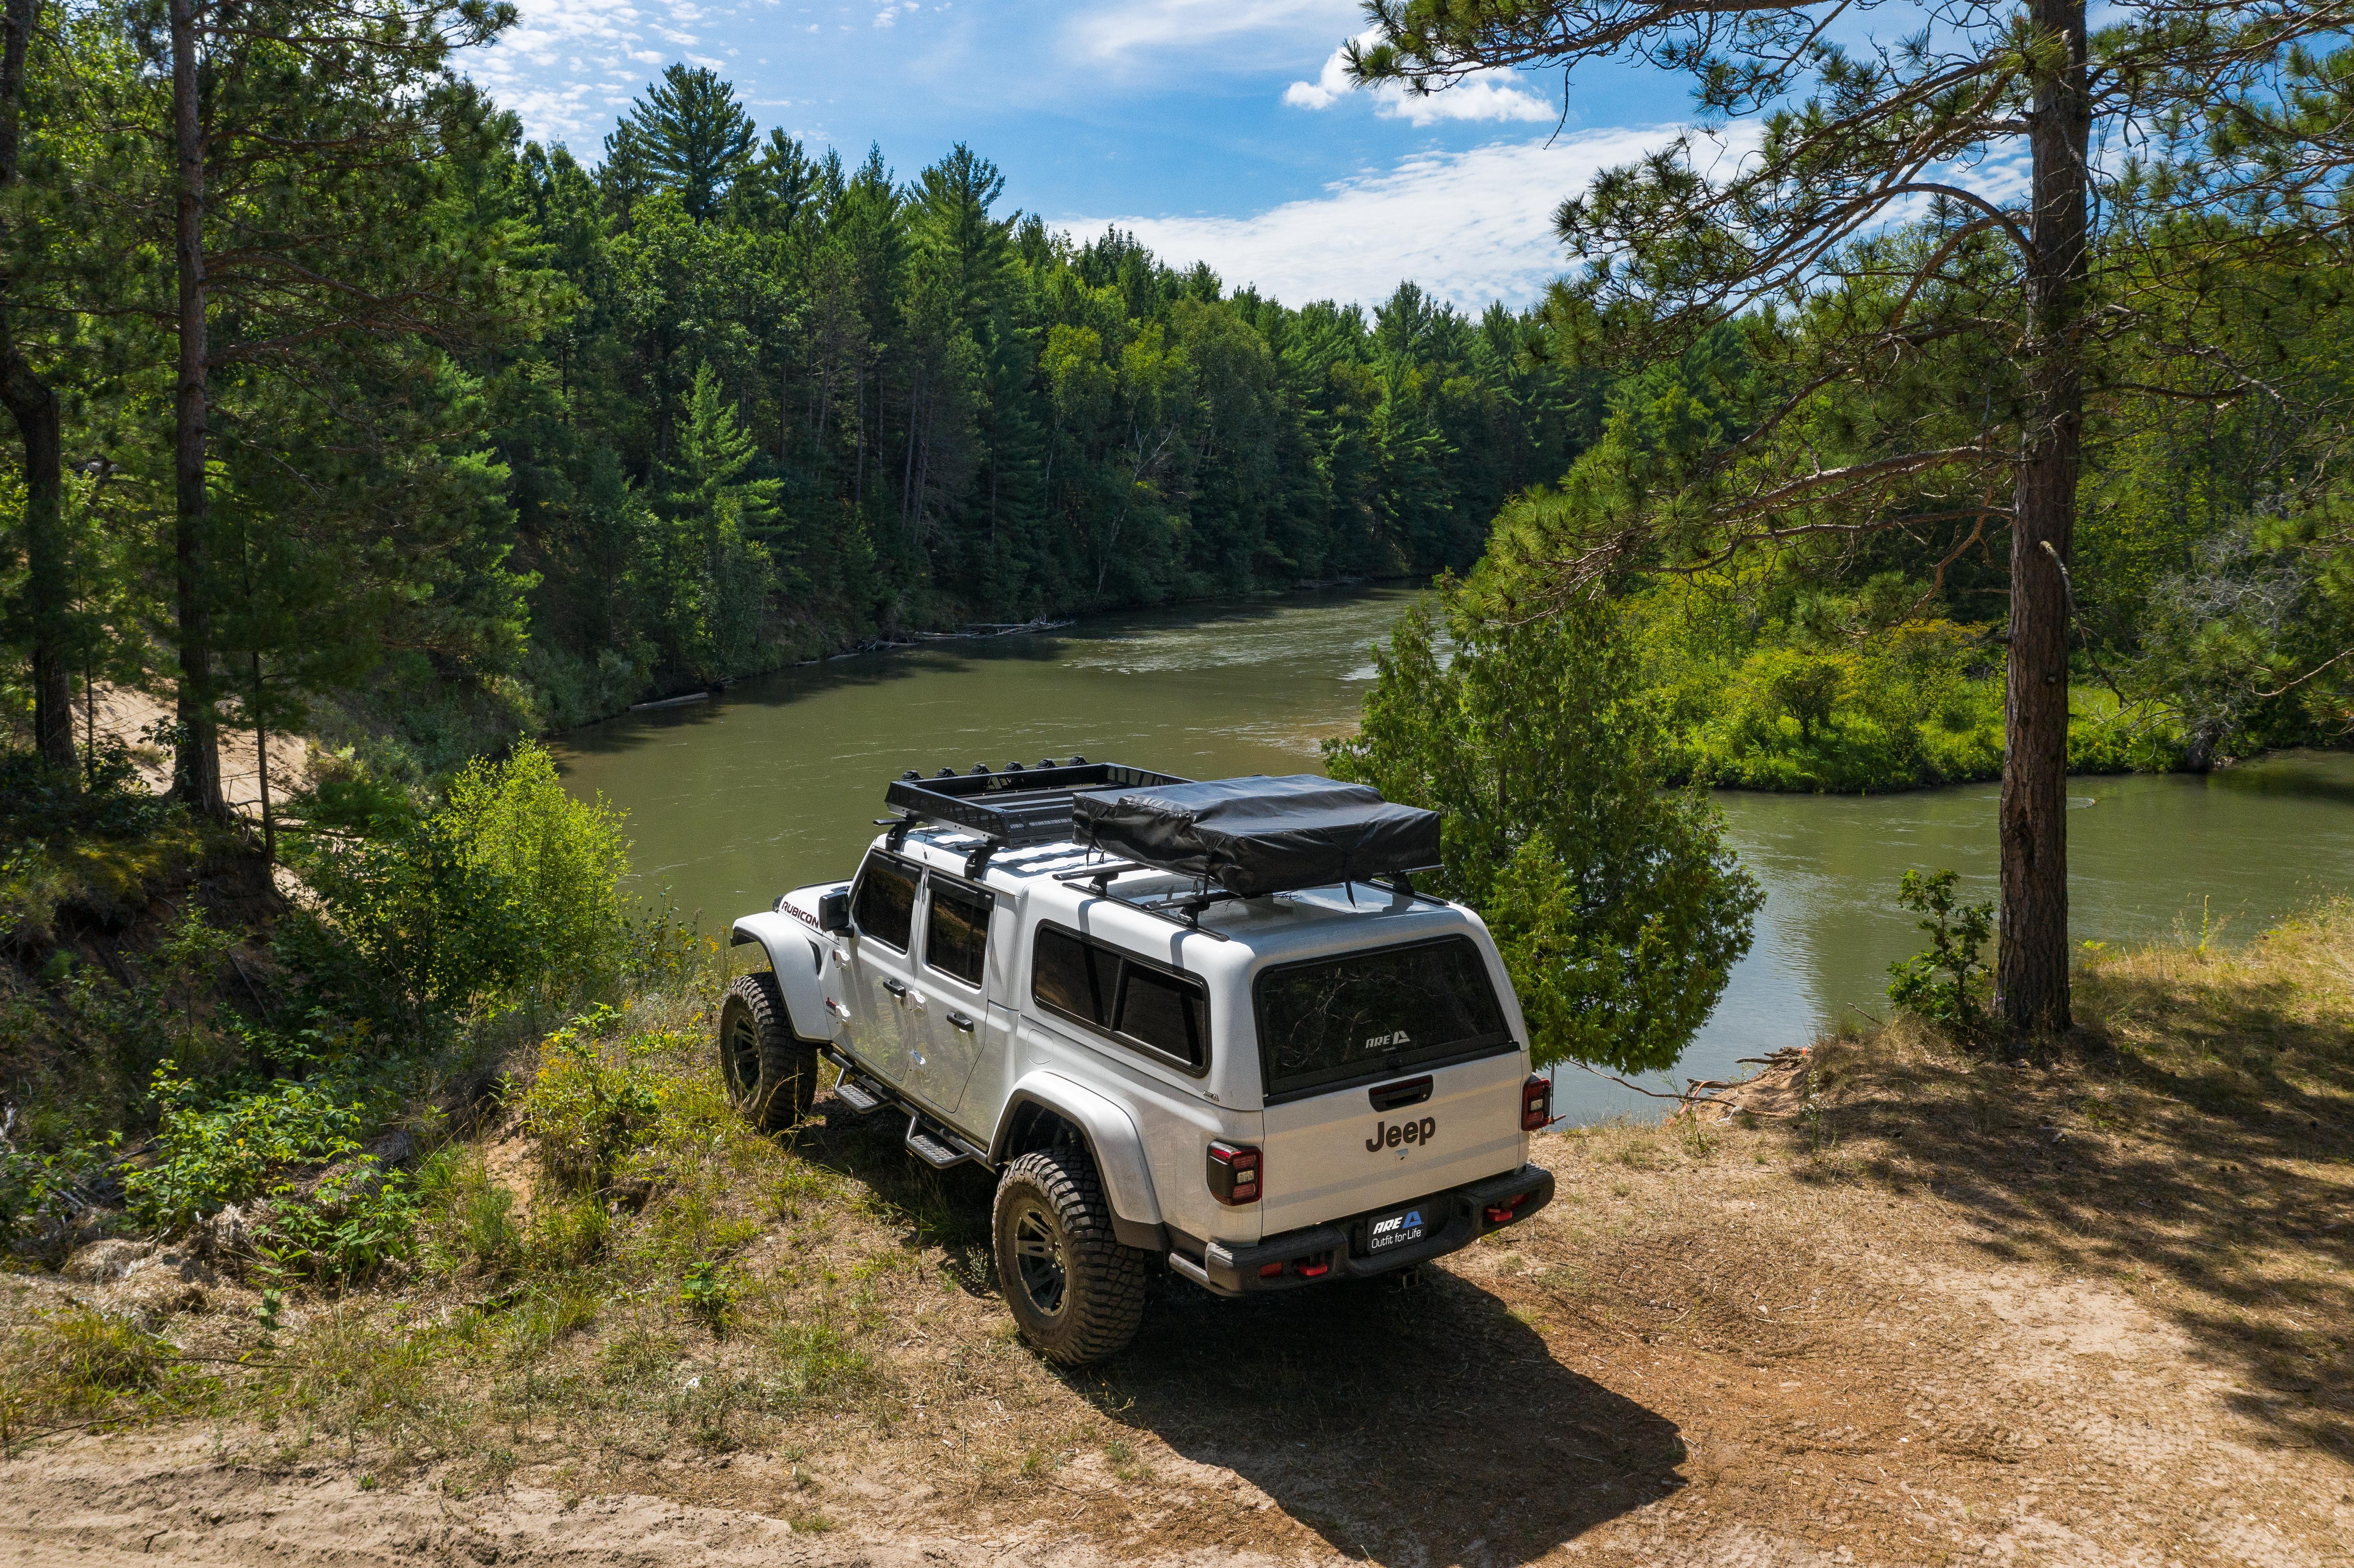 Jeep Gladiator Hardtop in Natur CXClassic